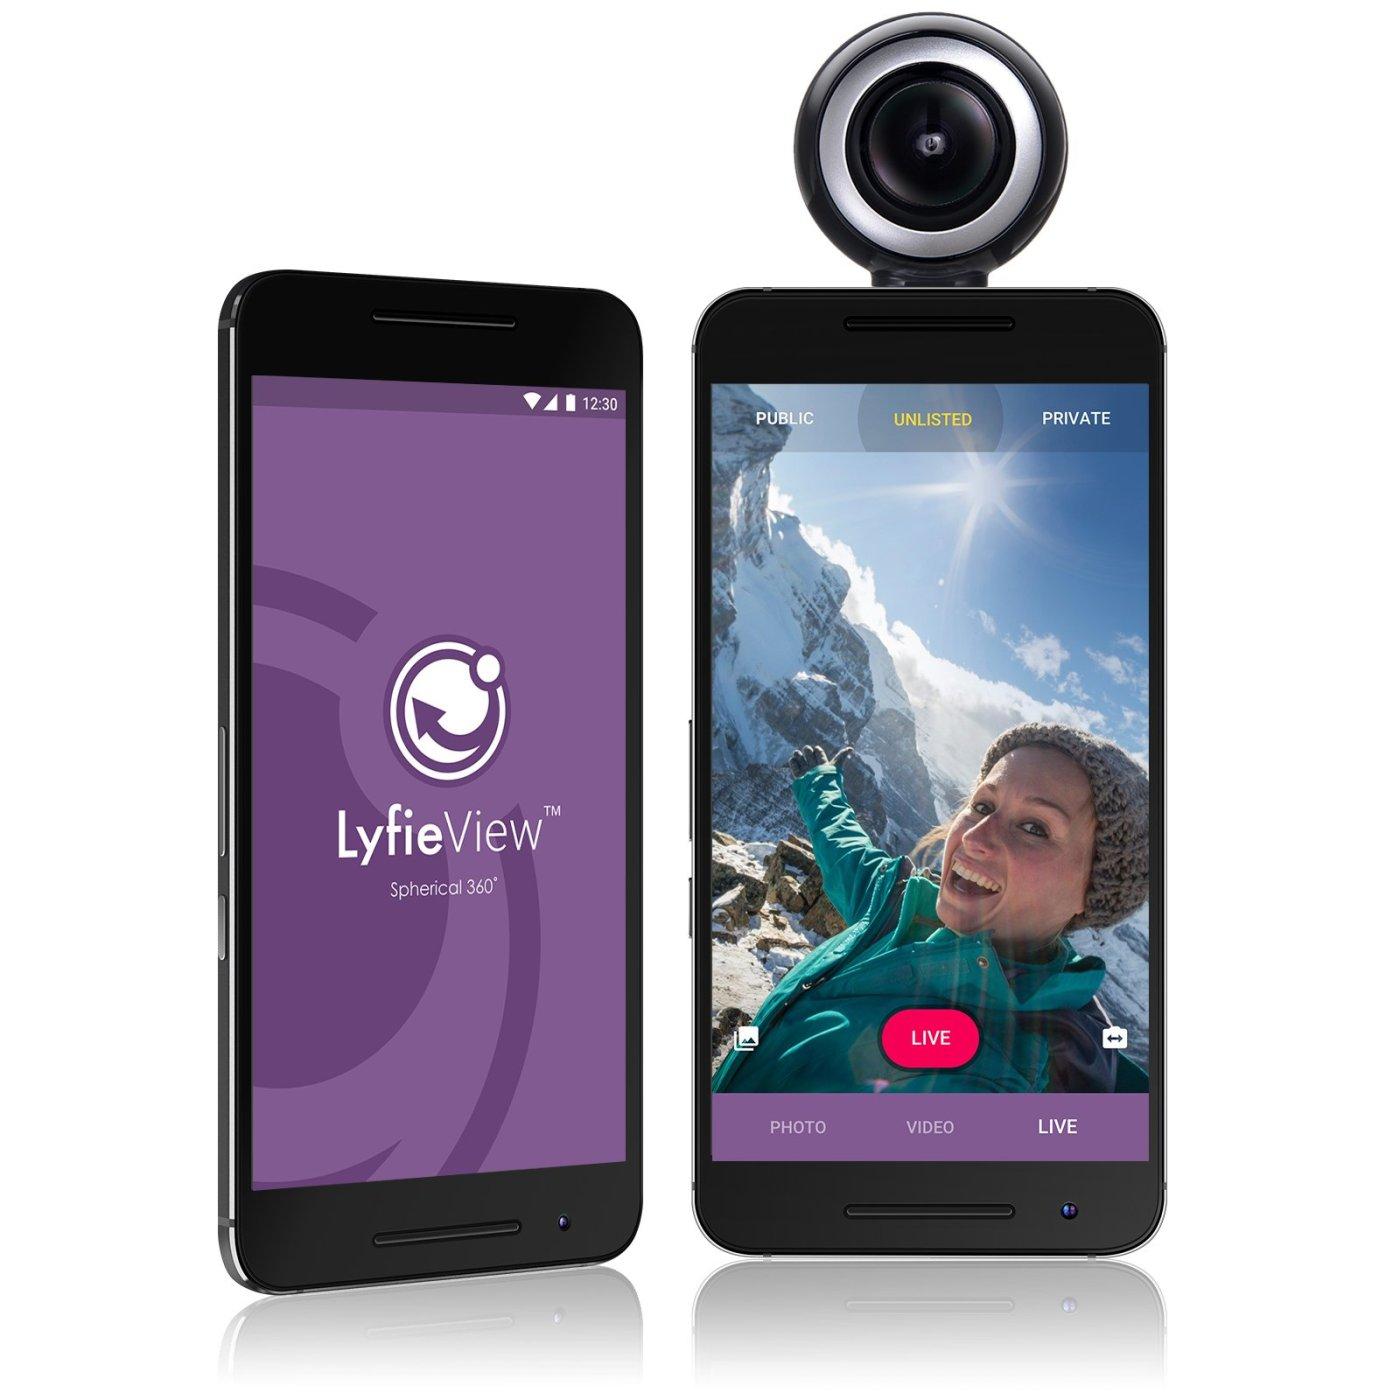 LyfieView 360 camera